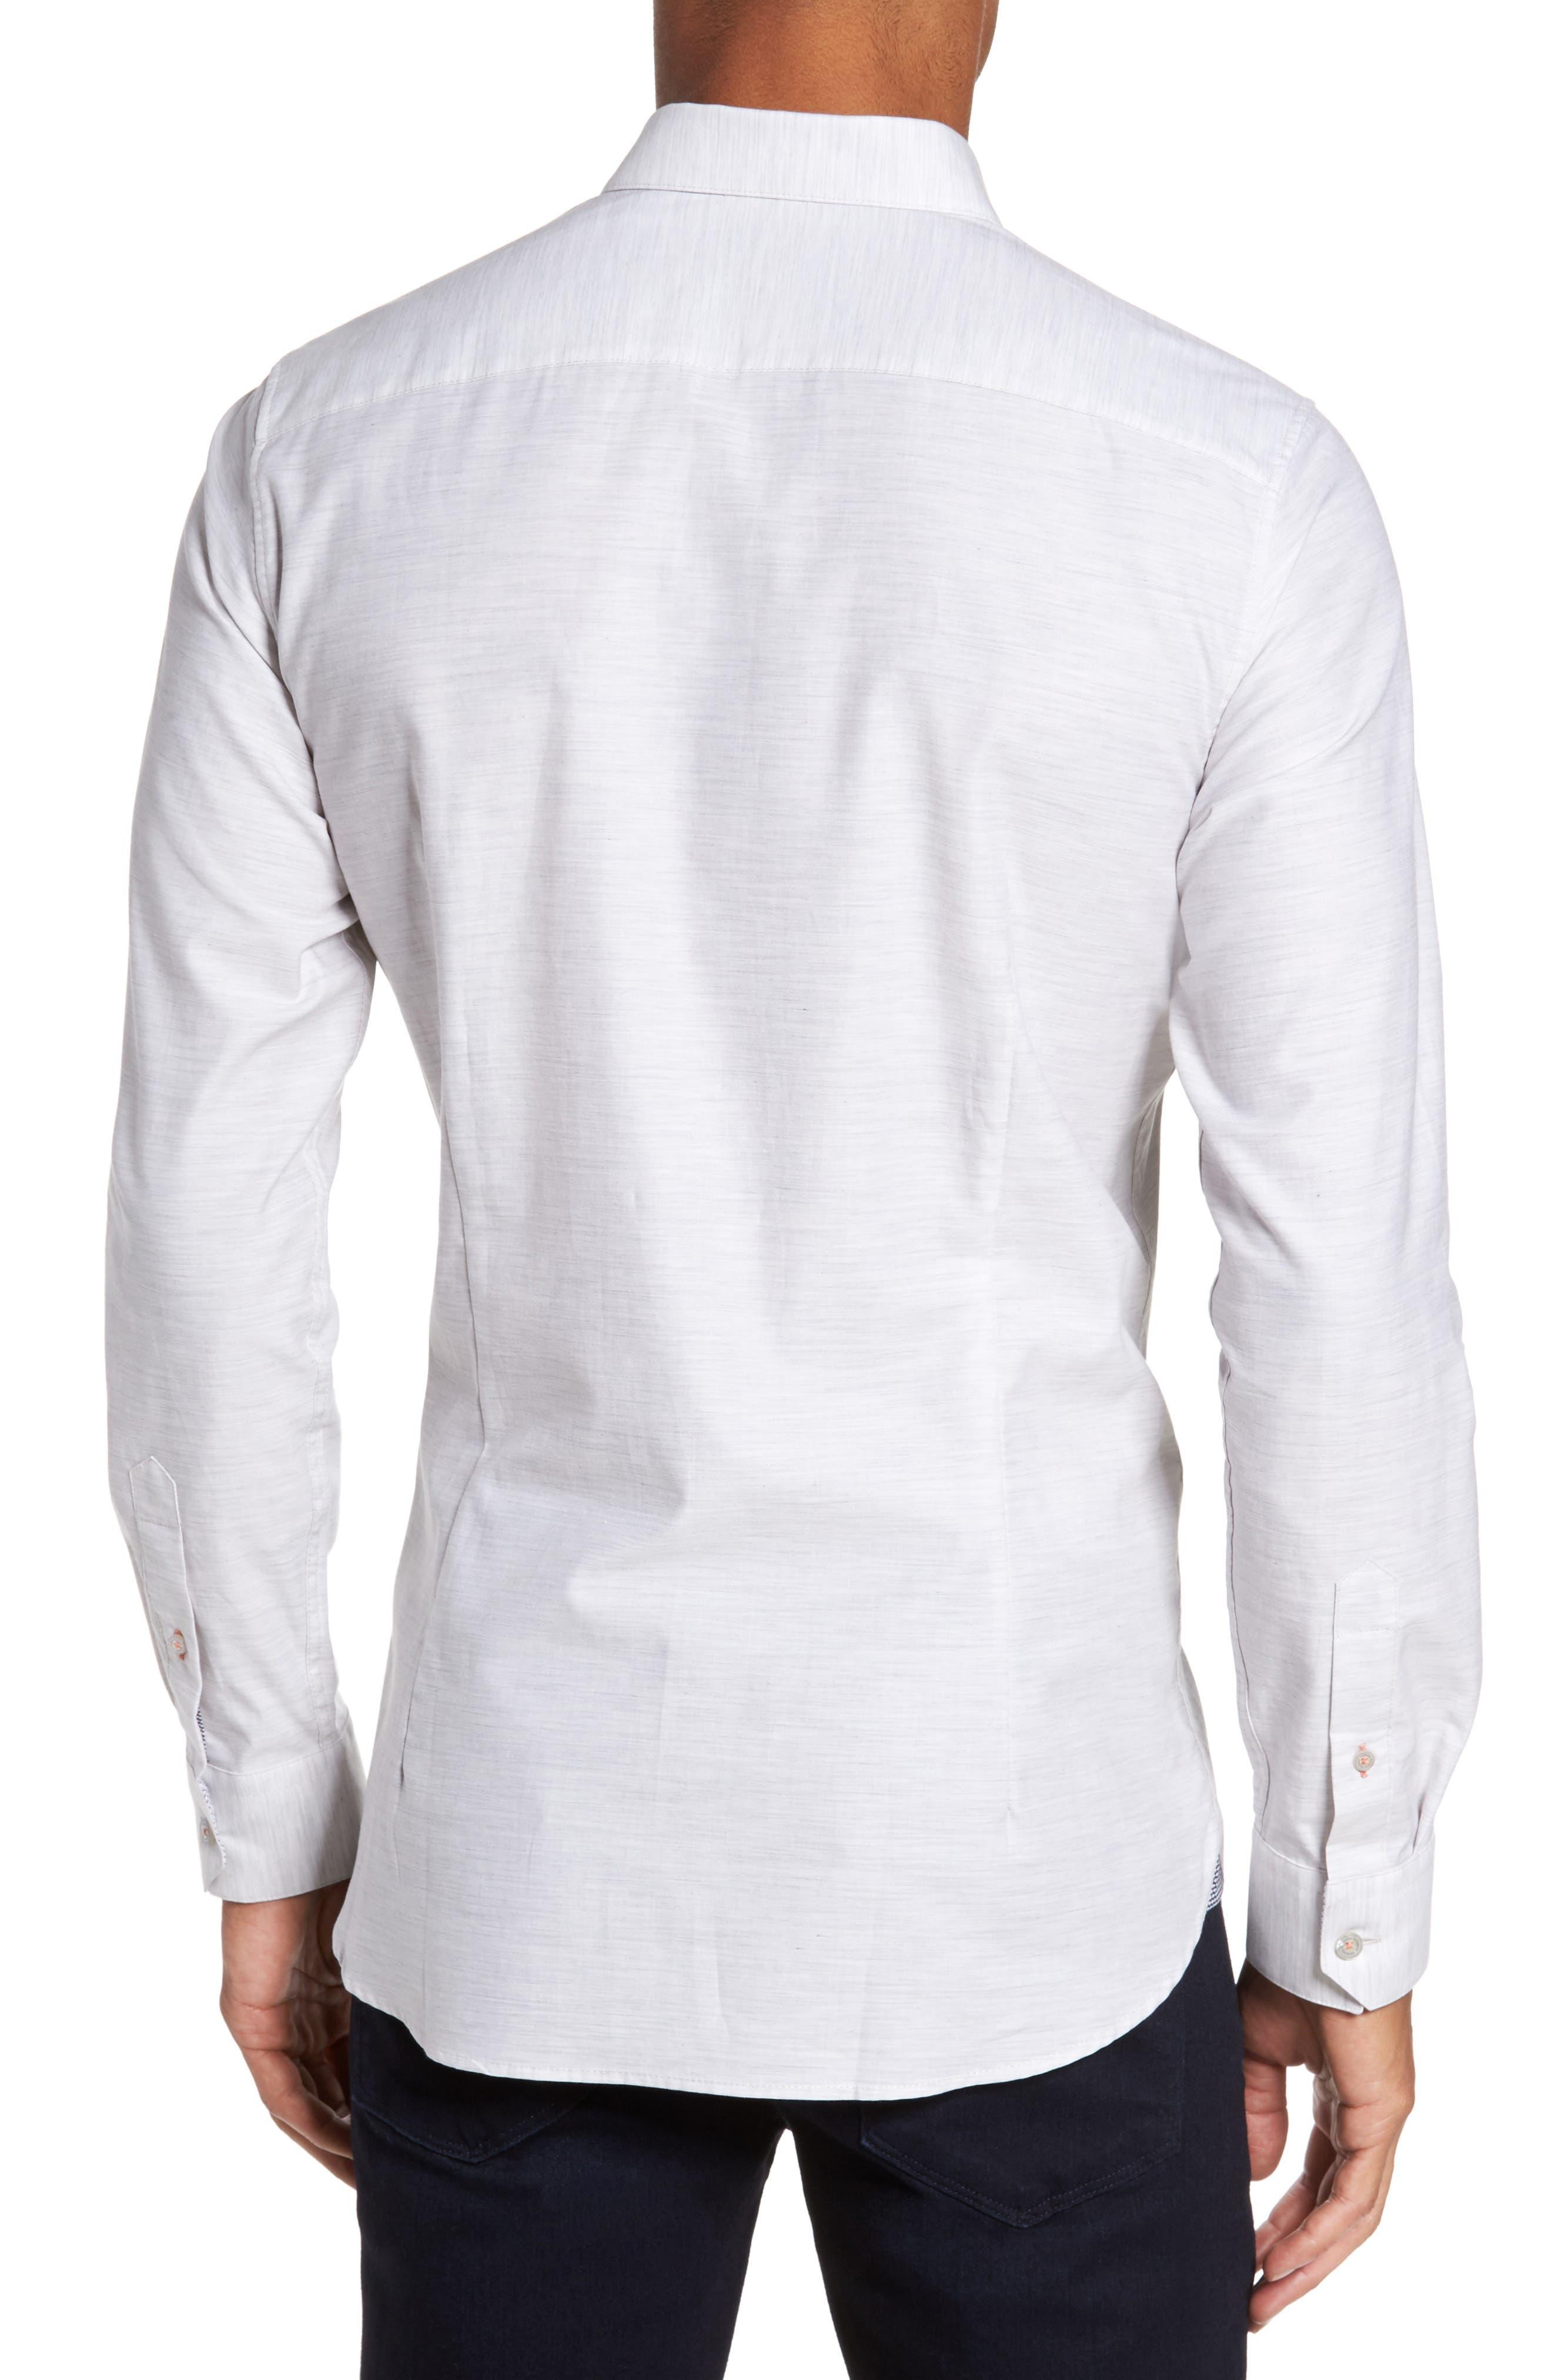 Annisley Modern Slim Fit Sport Shirt,                             Alternate thumbnail 2, color,                             031